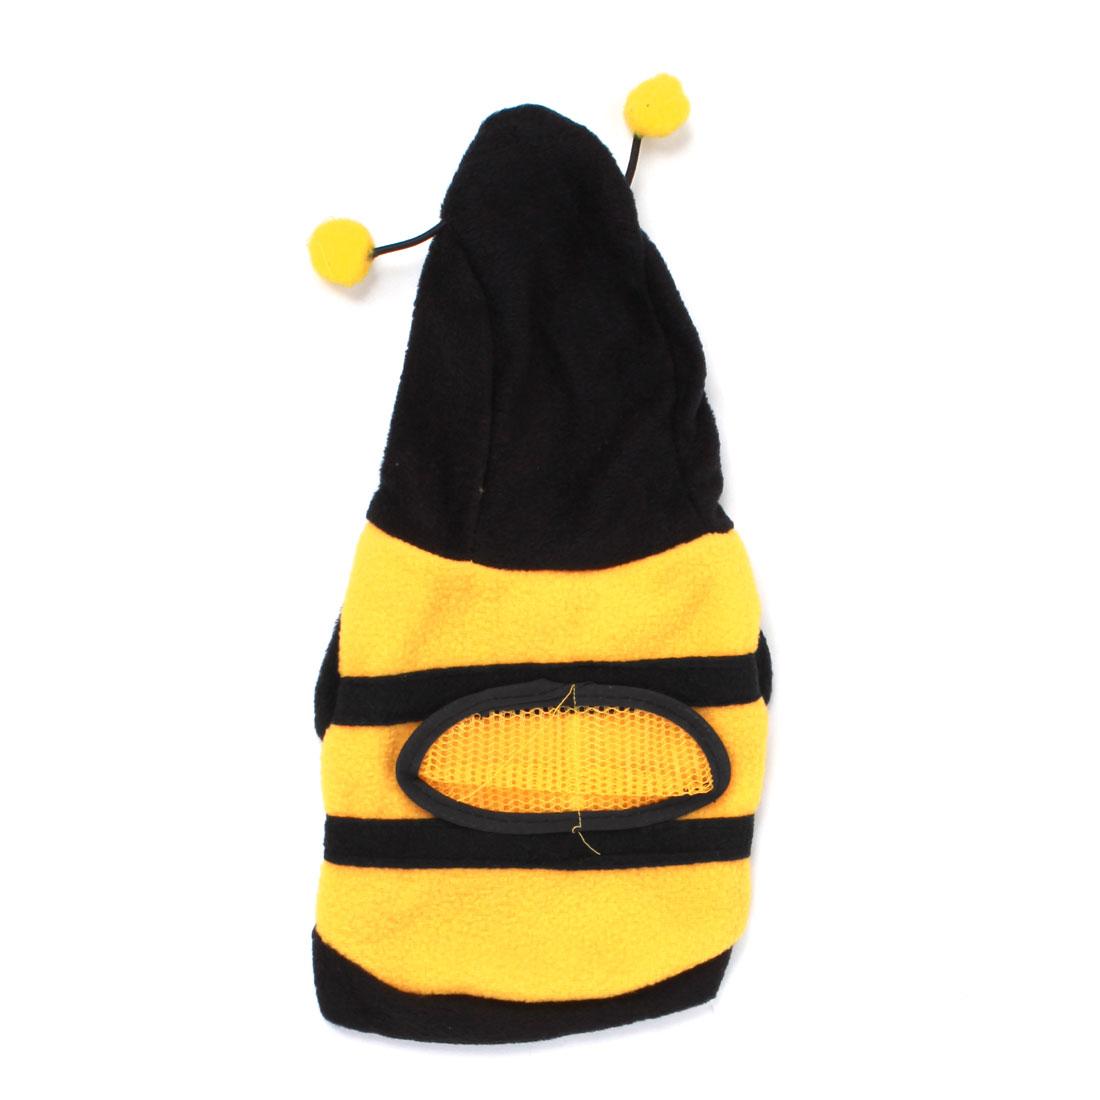 Unique Bargains Press Stud Button Bee Shaped Pet Dog Cat Hooded Clothes Coat Black Yellow XXS